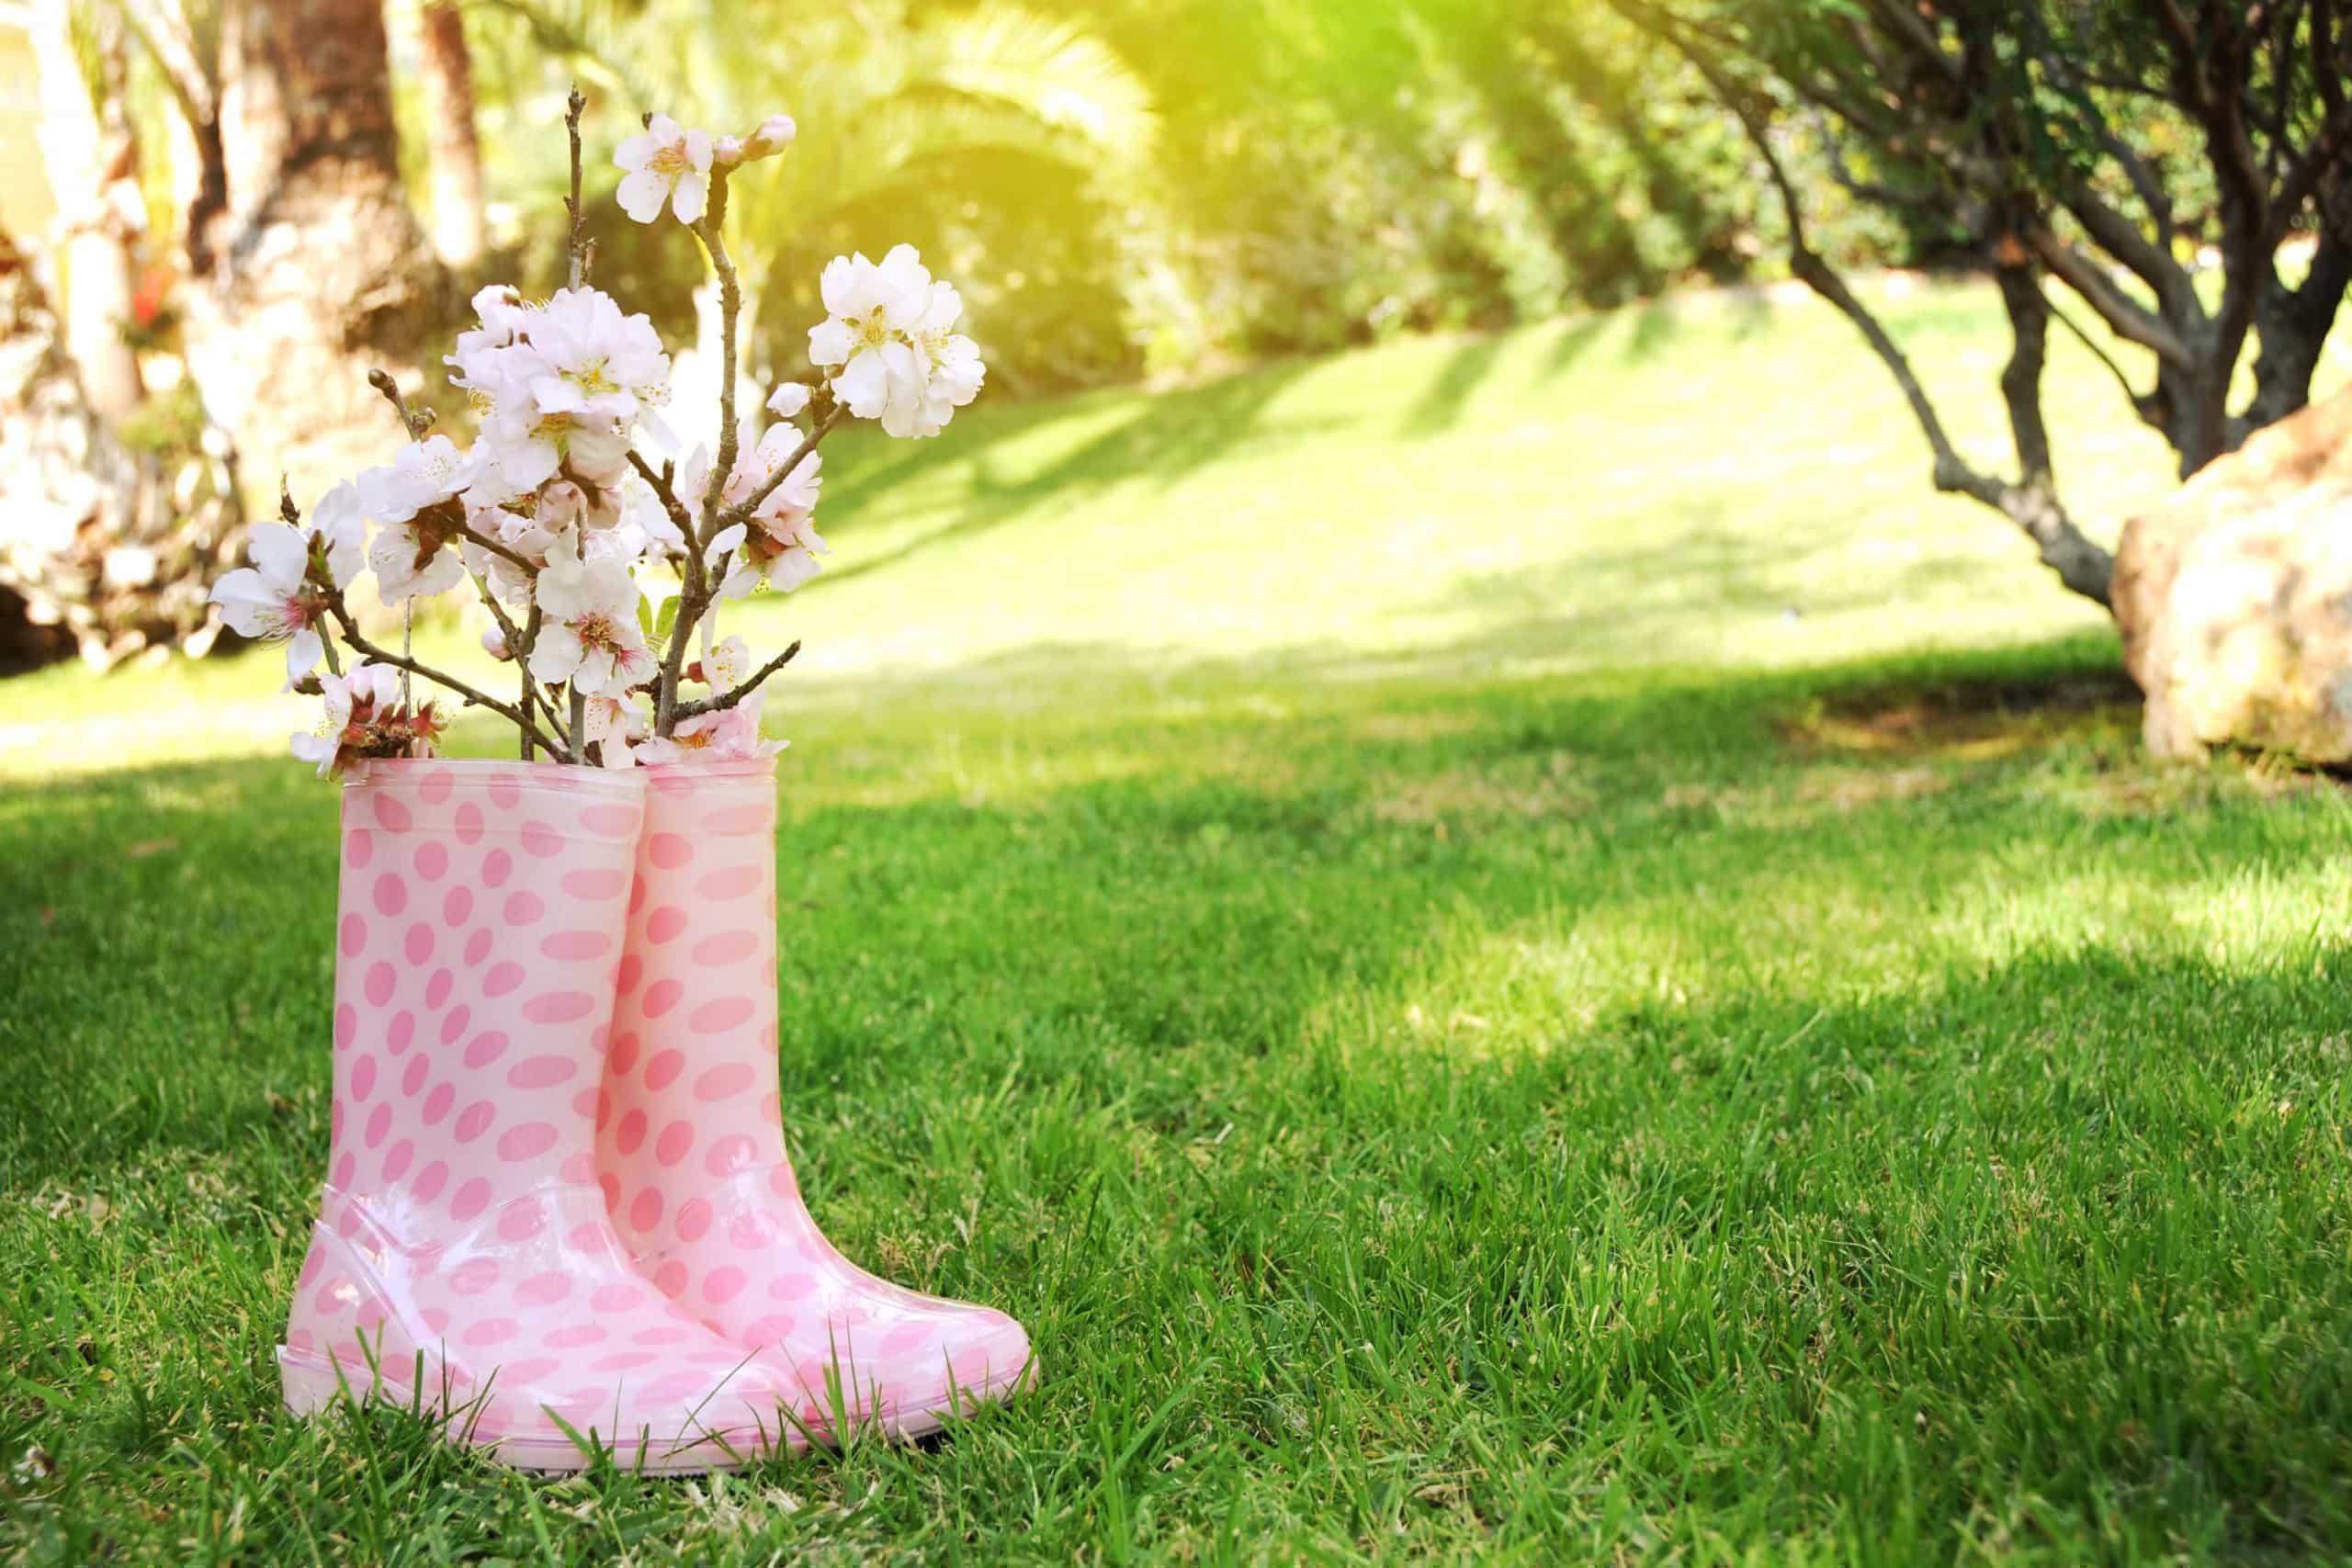 Tenha o melhor jardim nesta primavera